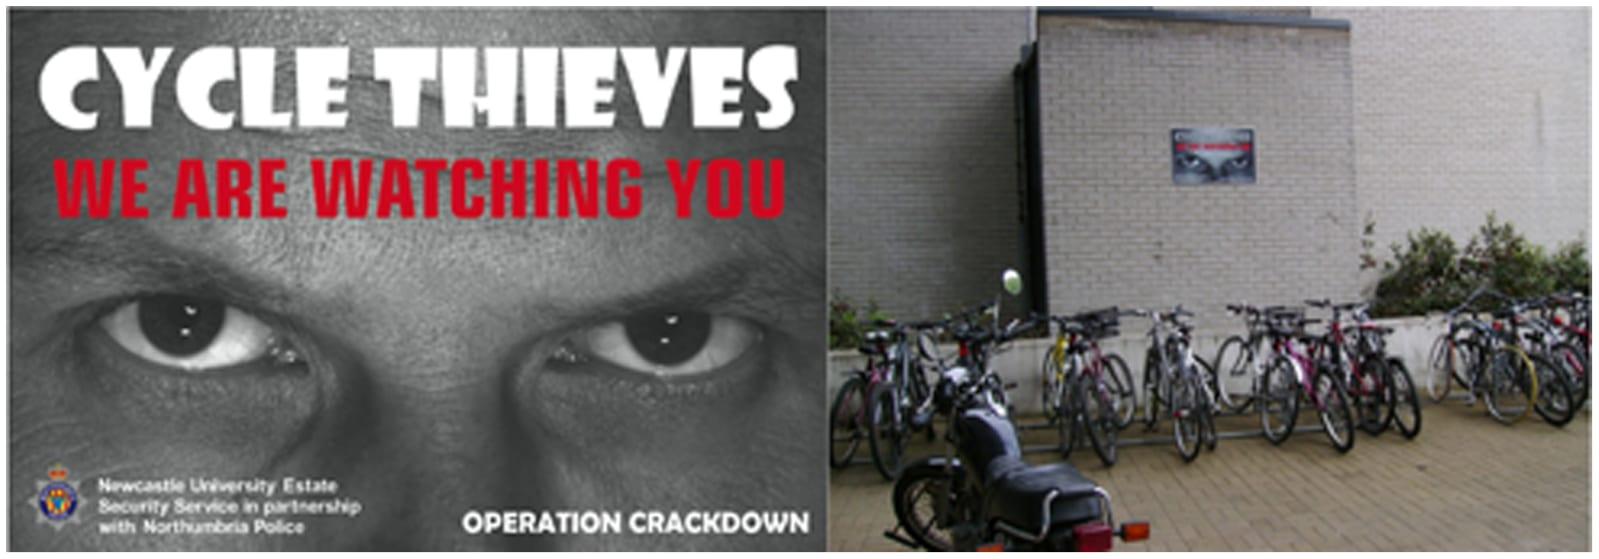 eye bike theft